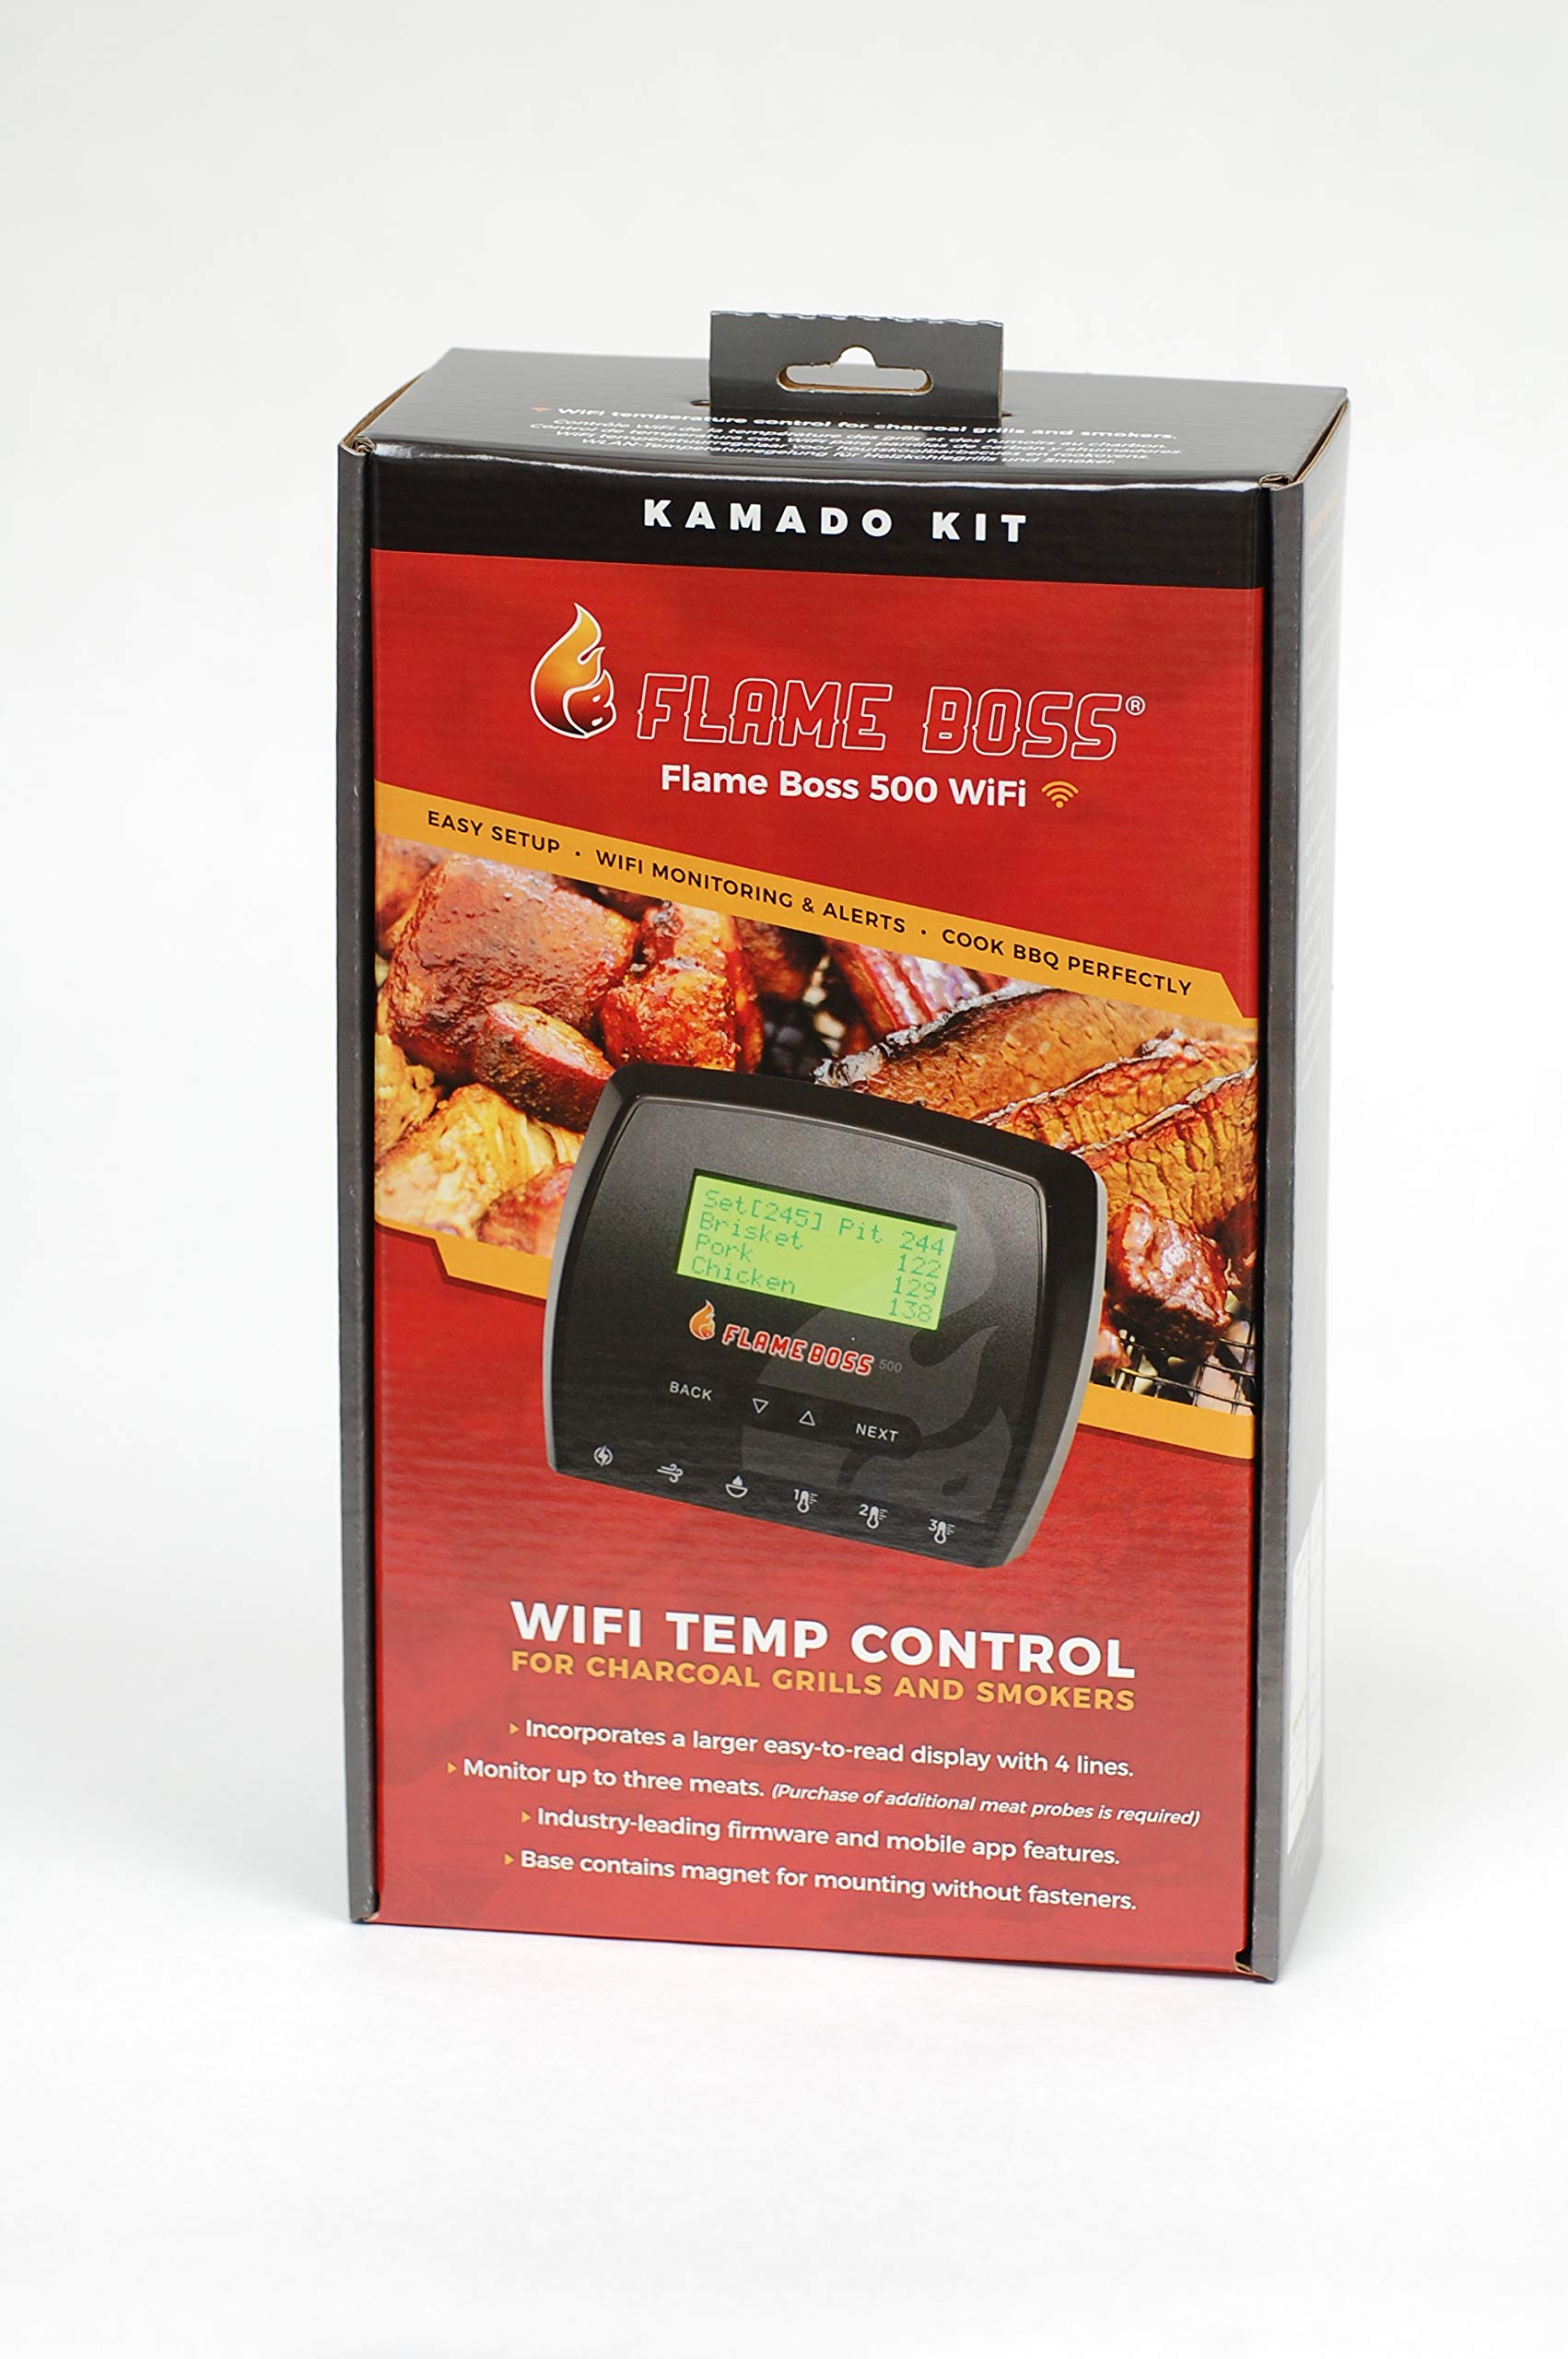 Flame Boss 500-WiFi Smoker Controller (Kamado) by Flame Boss (Image #3)